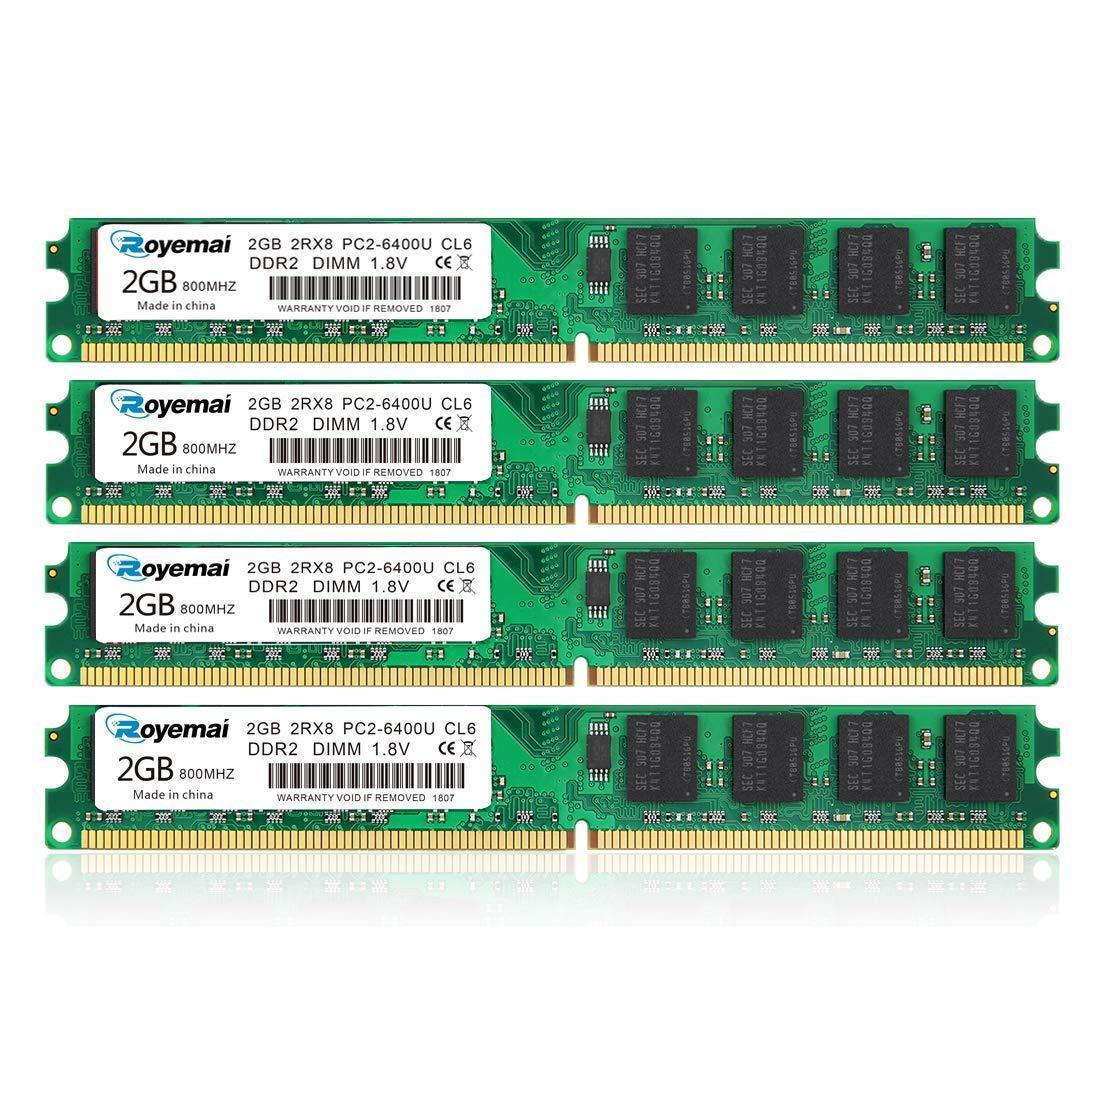 Memoria RAM 4GB Kit (2x2GB) DDR2 800 Udimm ROYEMAI DDR2-800 mhz PC2-6400 /PC2-6400U DDR2 2GB 1.8V CL6 240 Pin Non-ECC Un